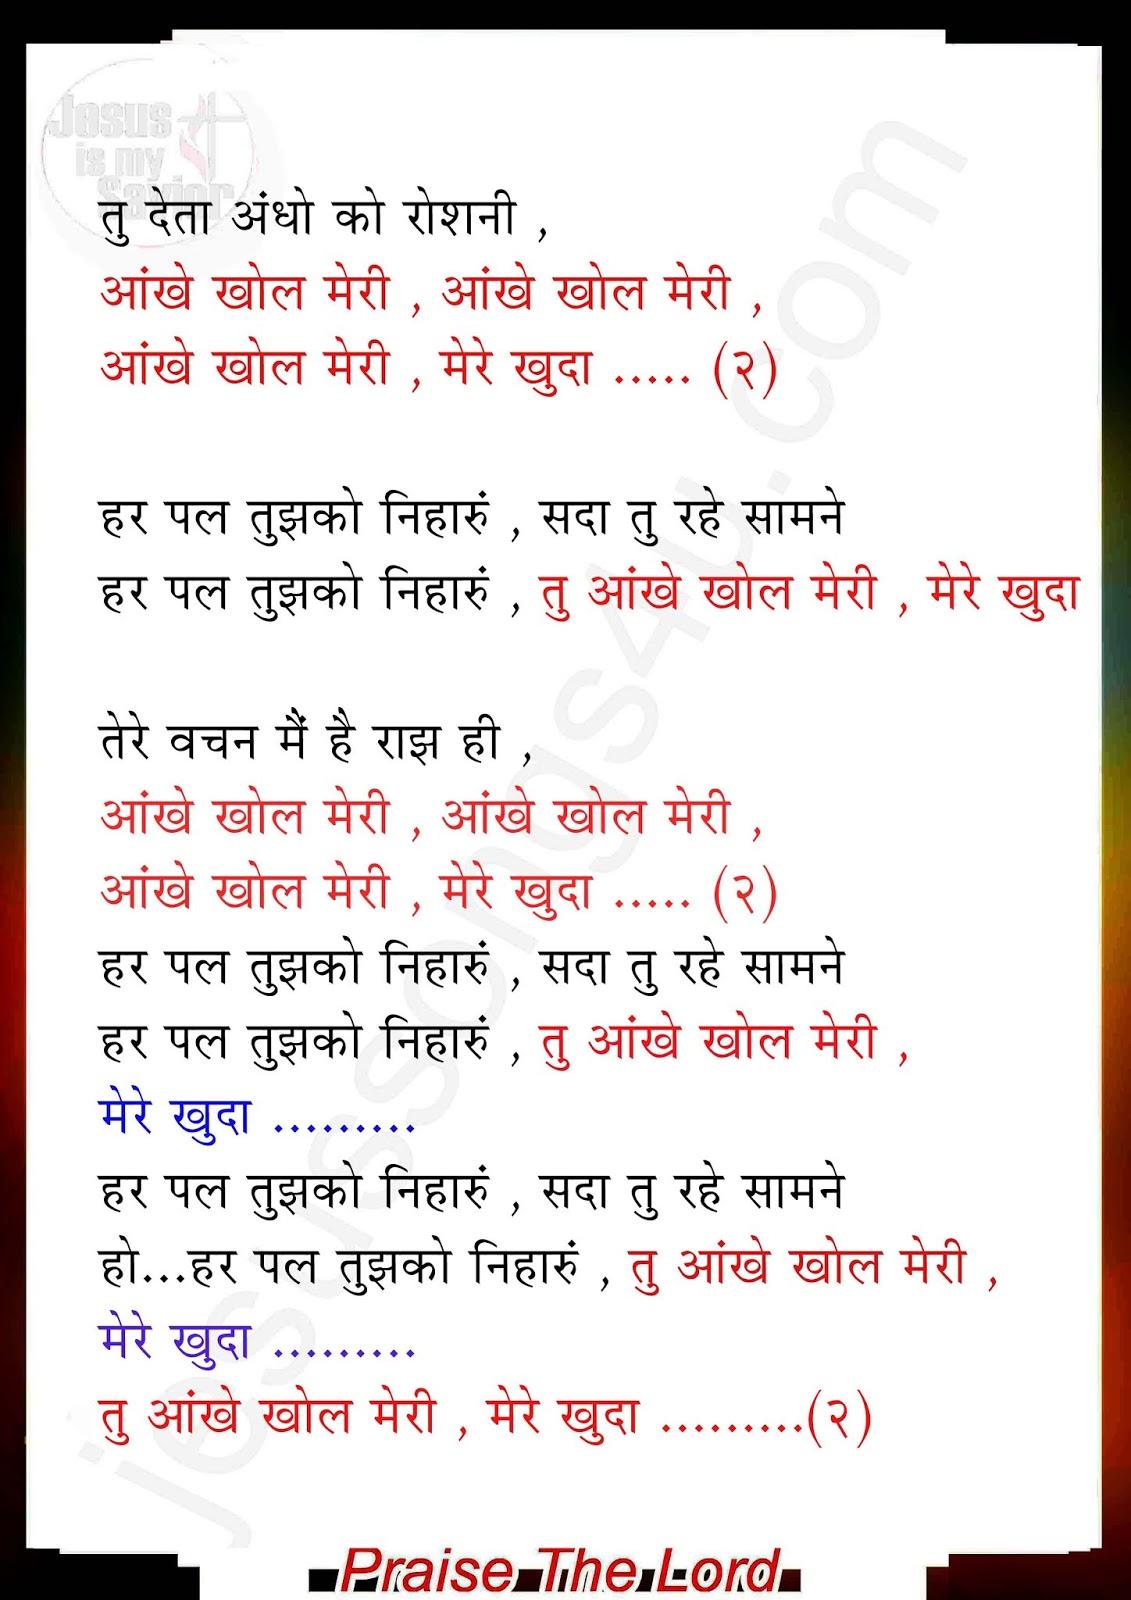 Lyrics Center Lyrics Hindi Songs Hindi songs starting with letter a. lyrics center lyrics hindi songs